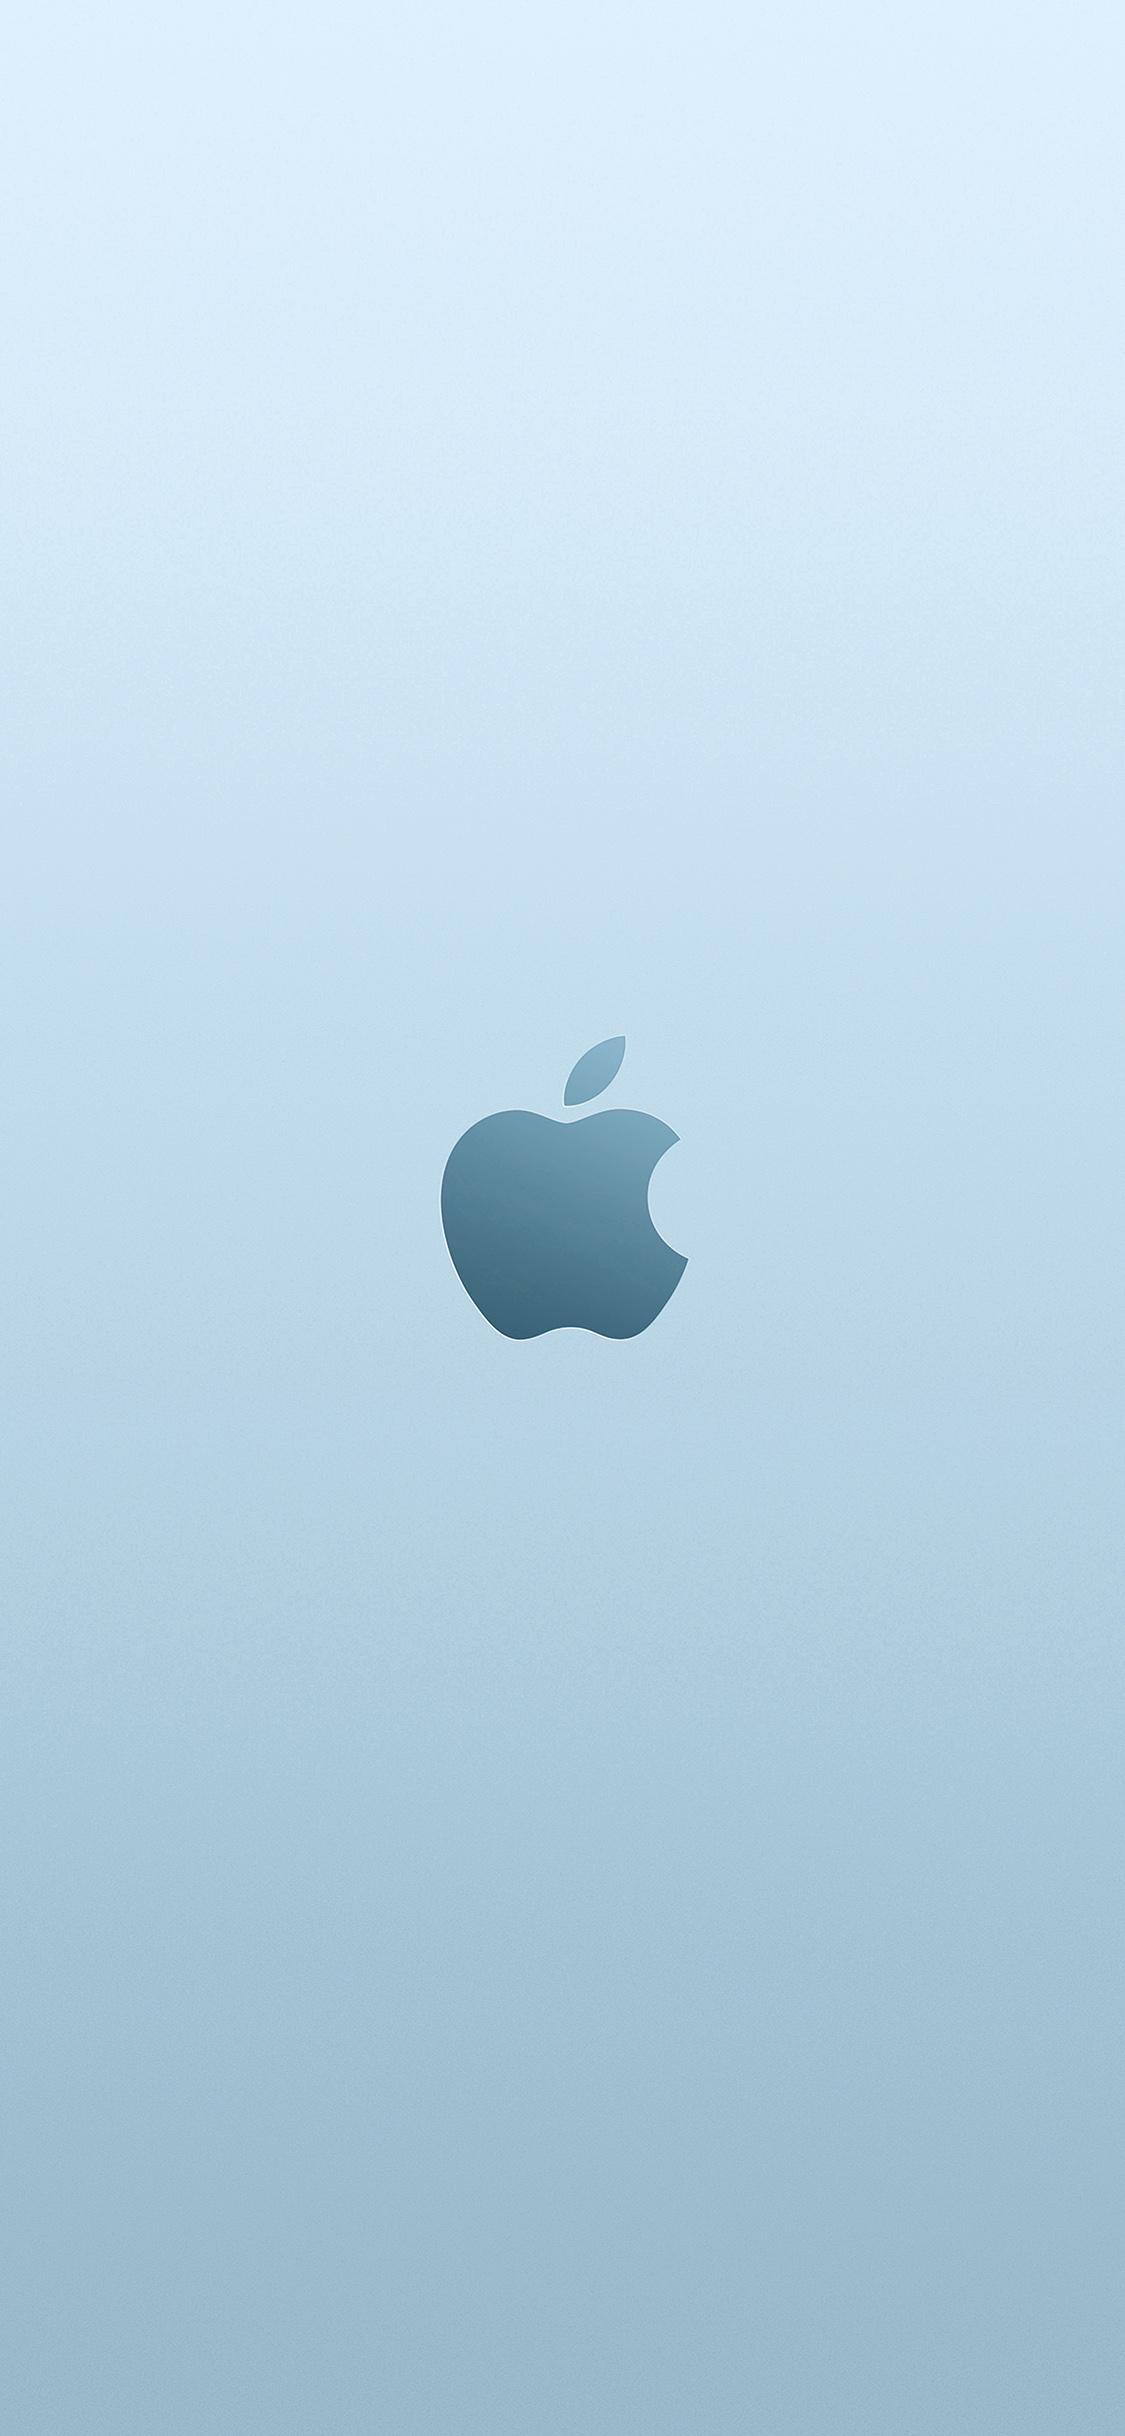 iPhoneXpapers.com-Apple-iPhone-wallpaper-au13-apple-blue-minimal-illustration-art